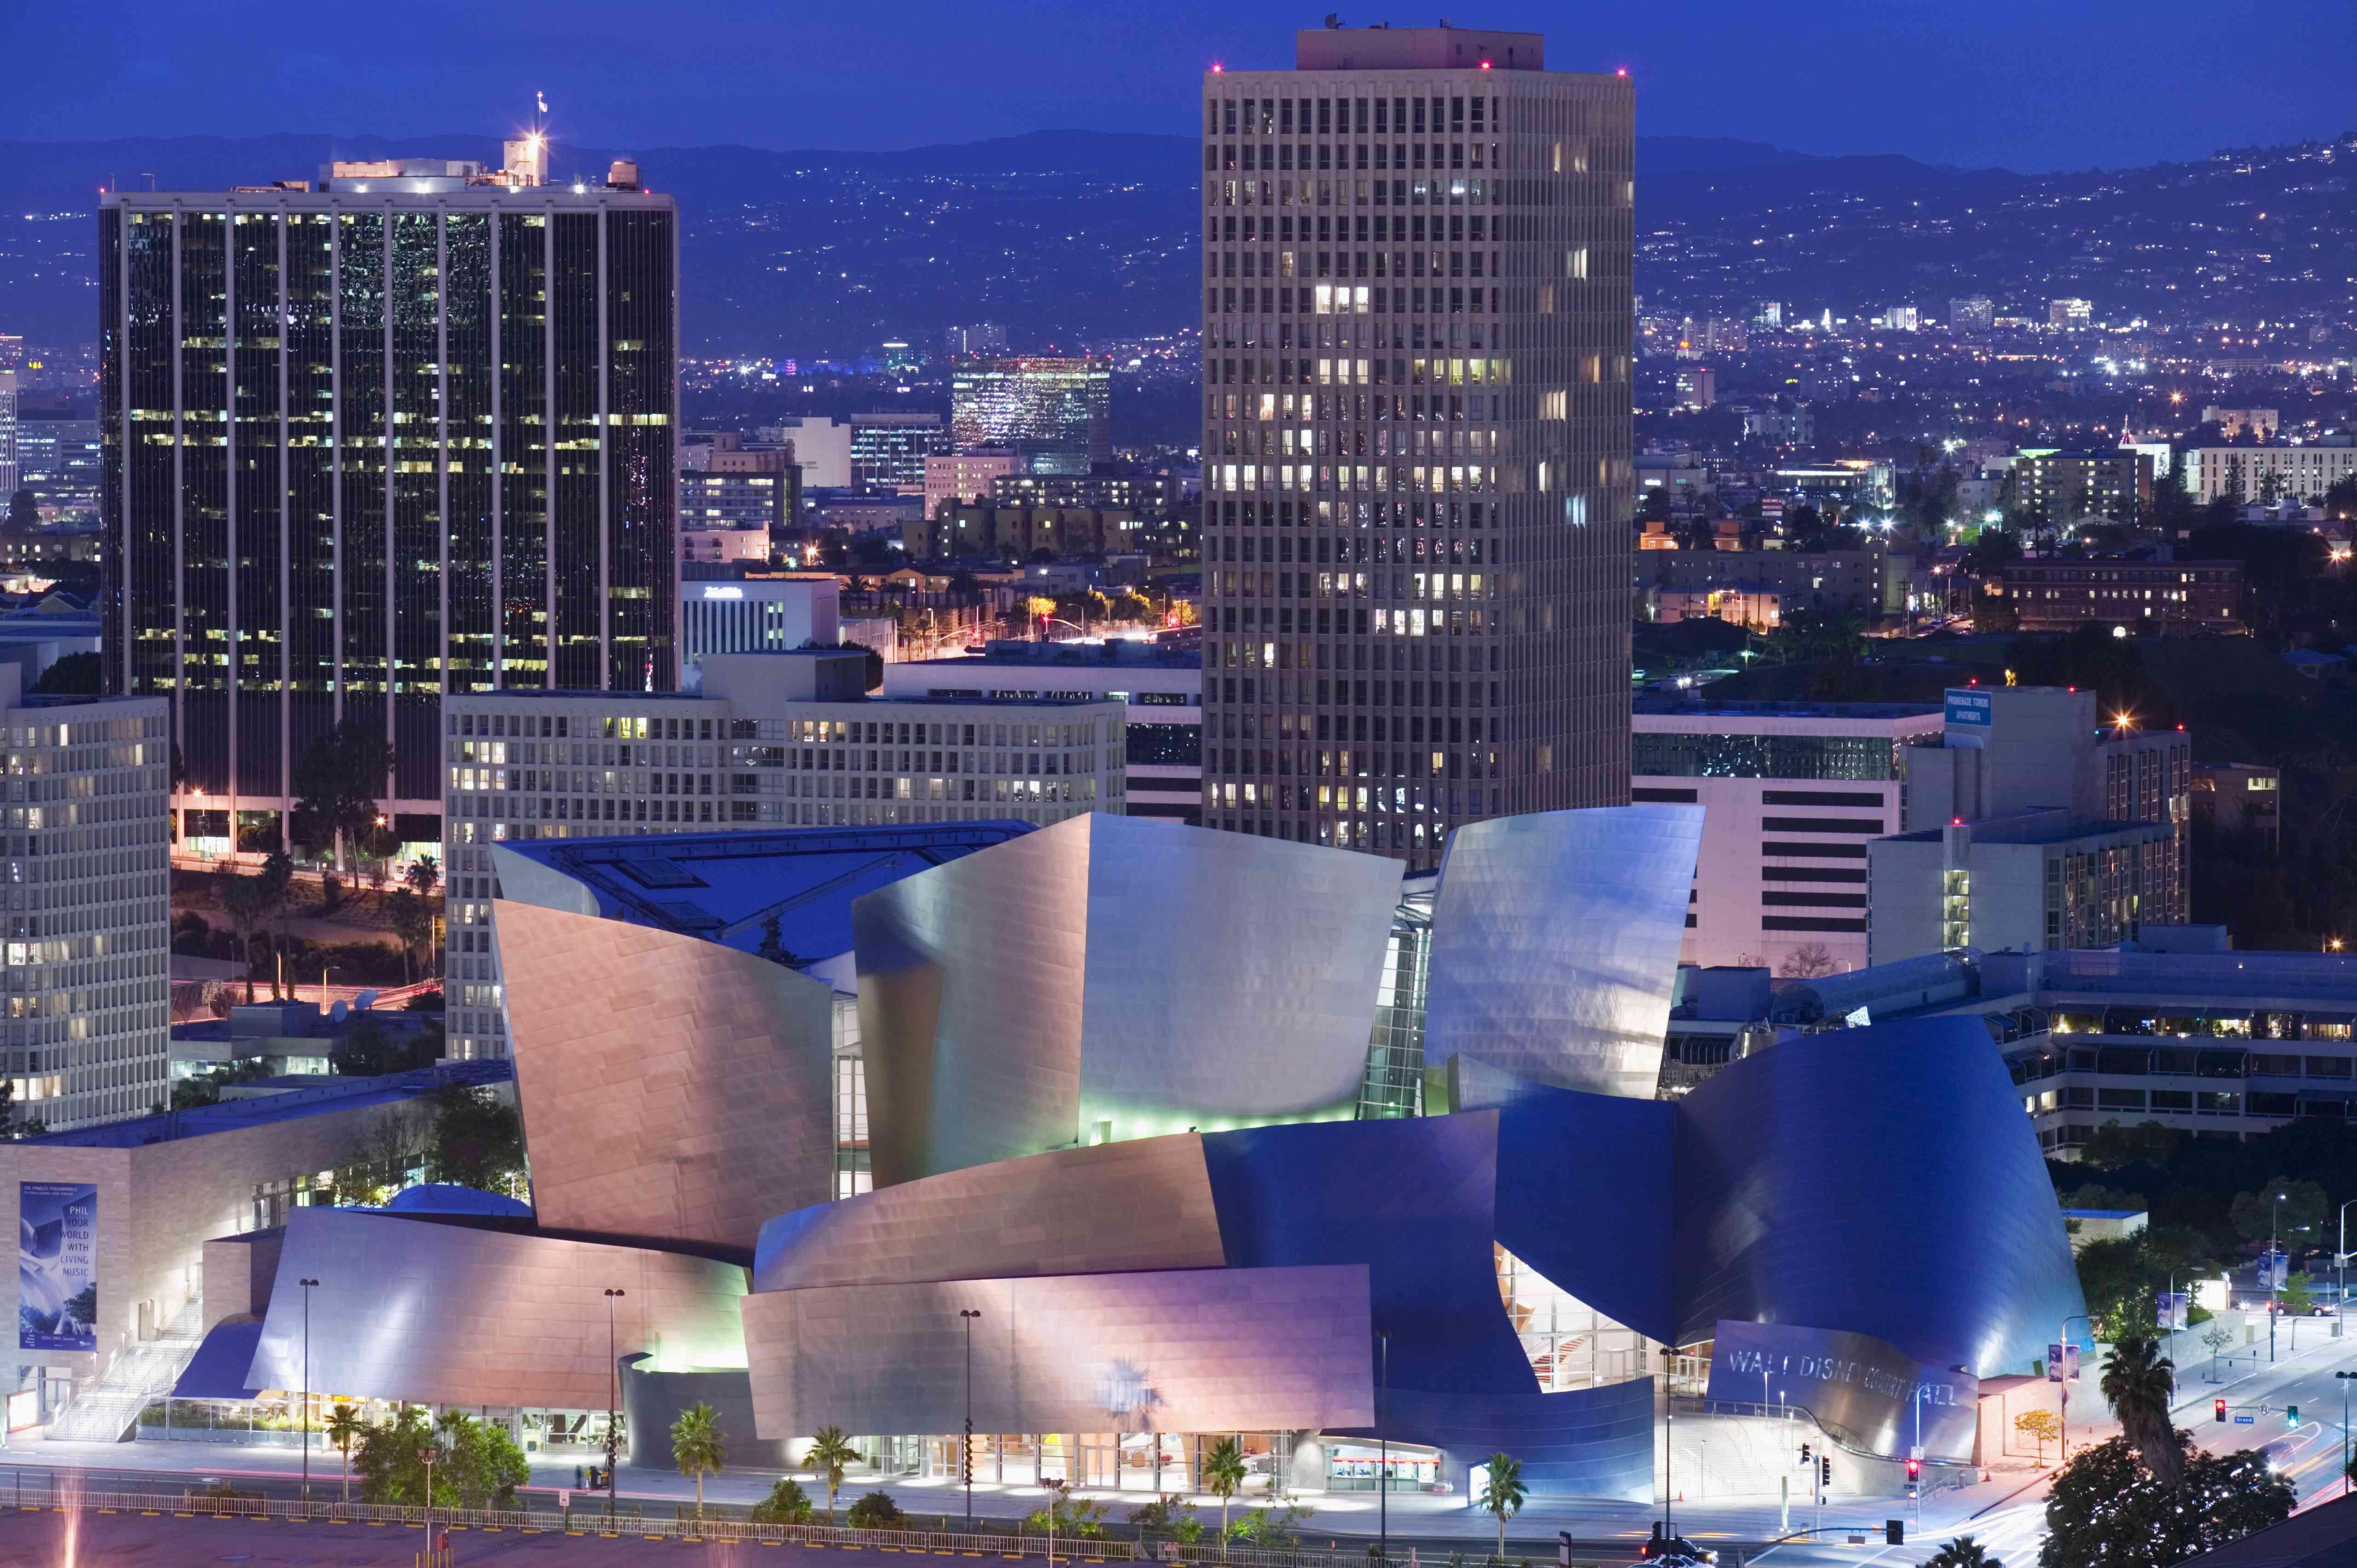 USA, California, Los Angeles, Walt Disney Concert Hall, elevated view